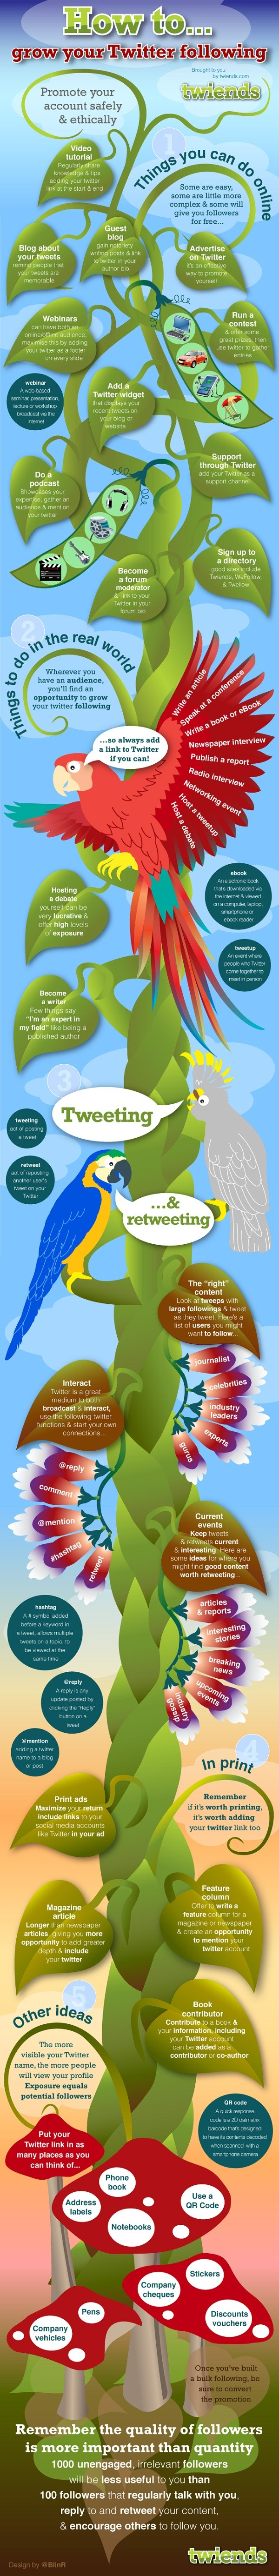 gagner des followers sur Twitter